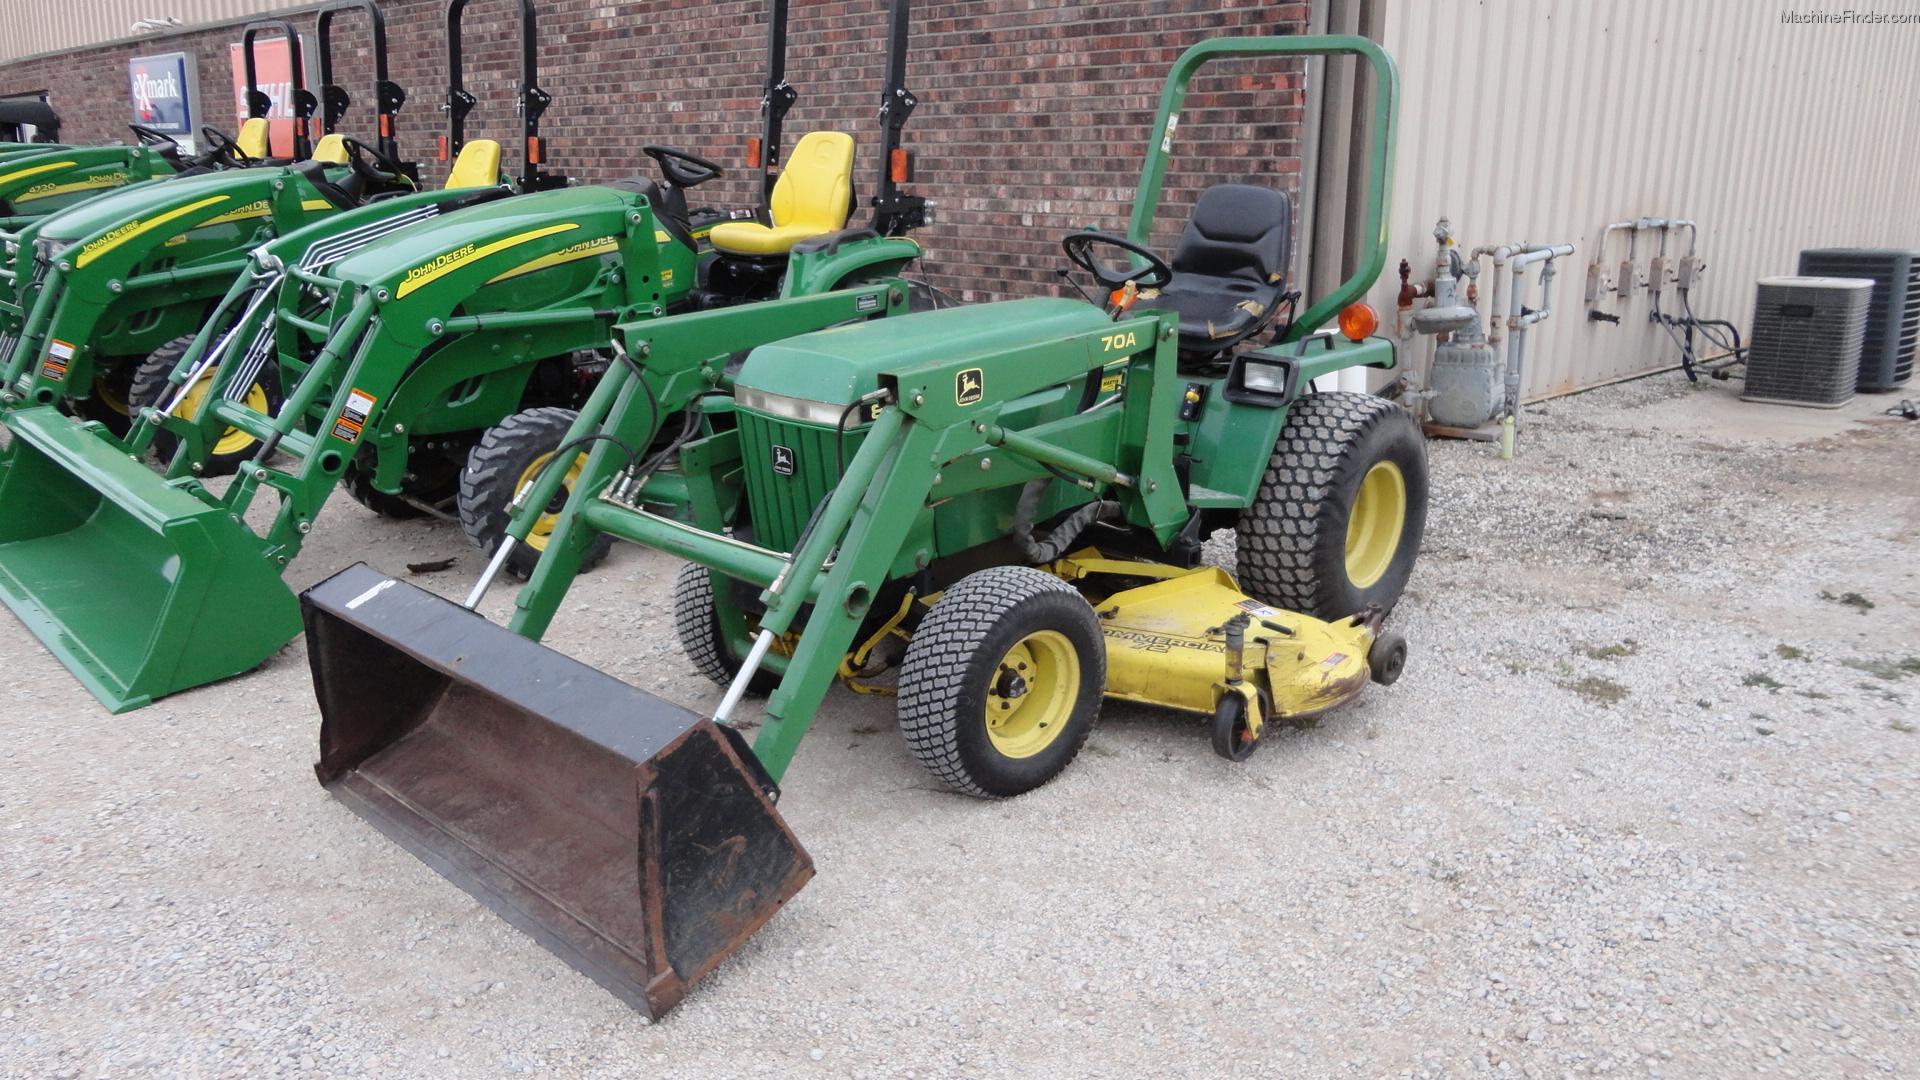 1992 John Deere 855 Tractors - Compact (1-40hp.) - John ...